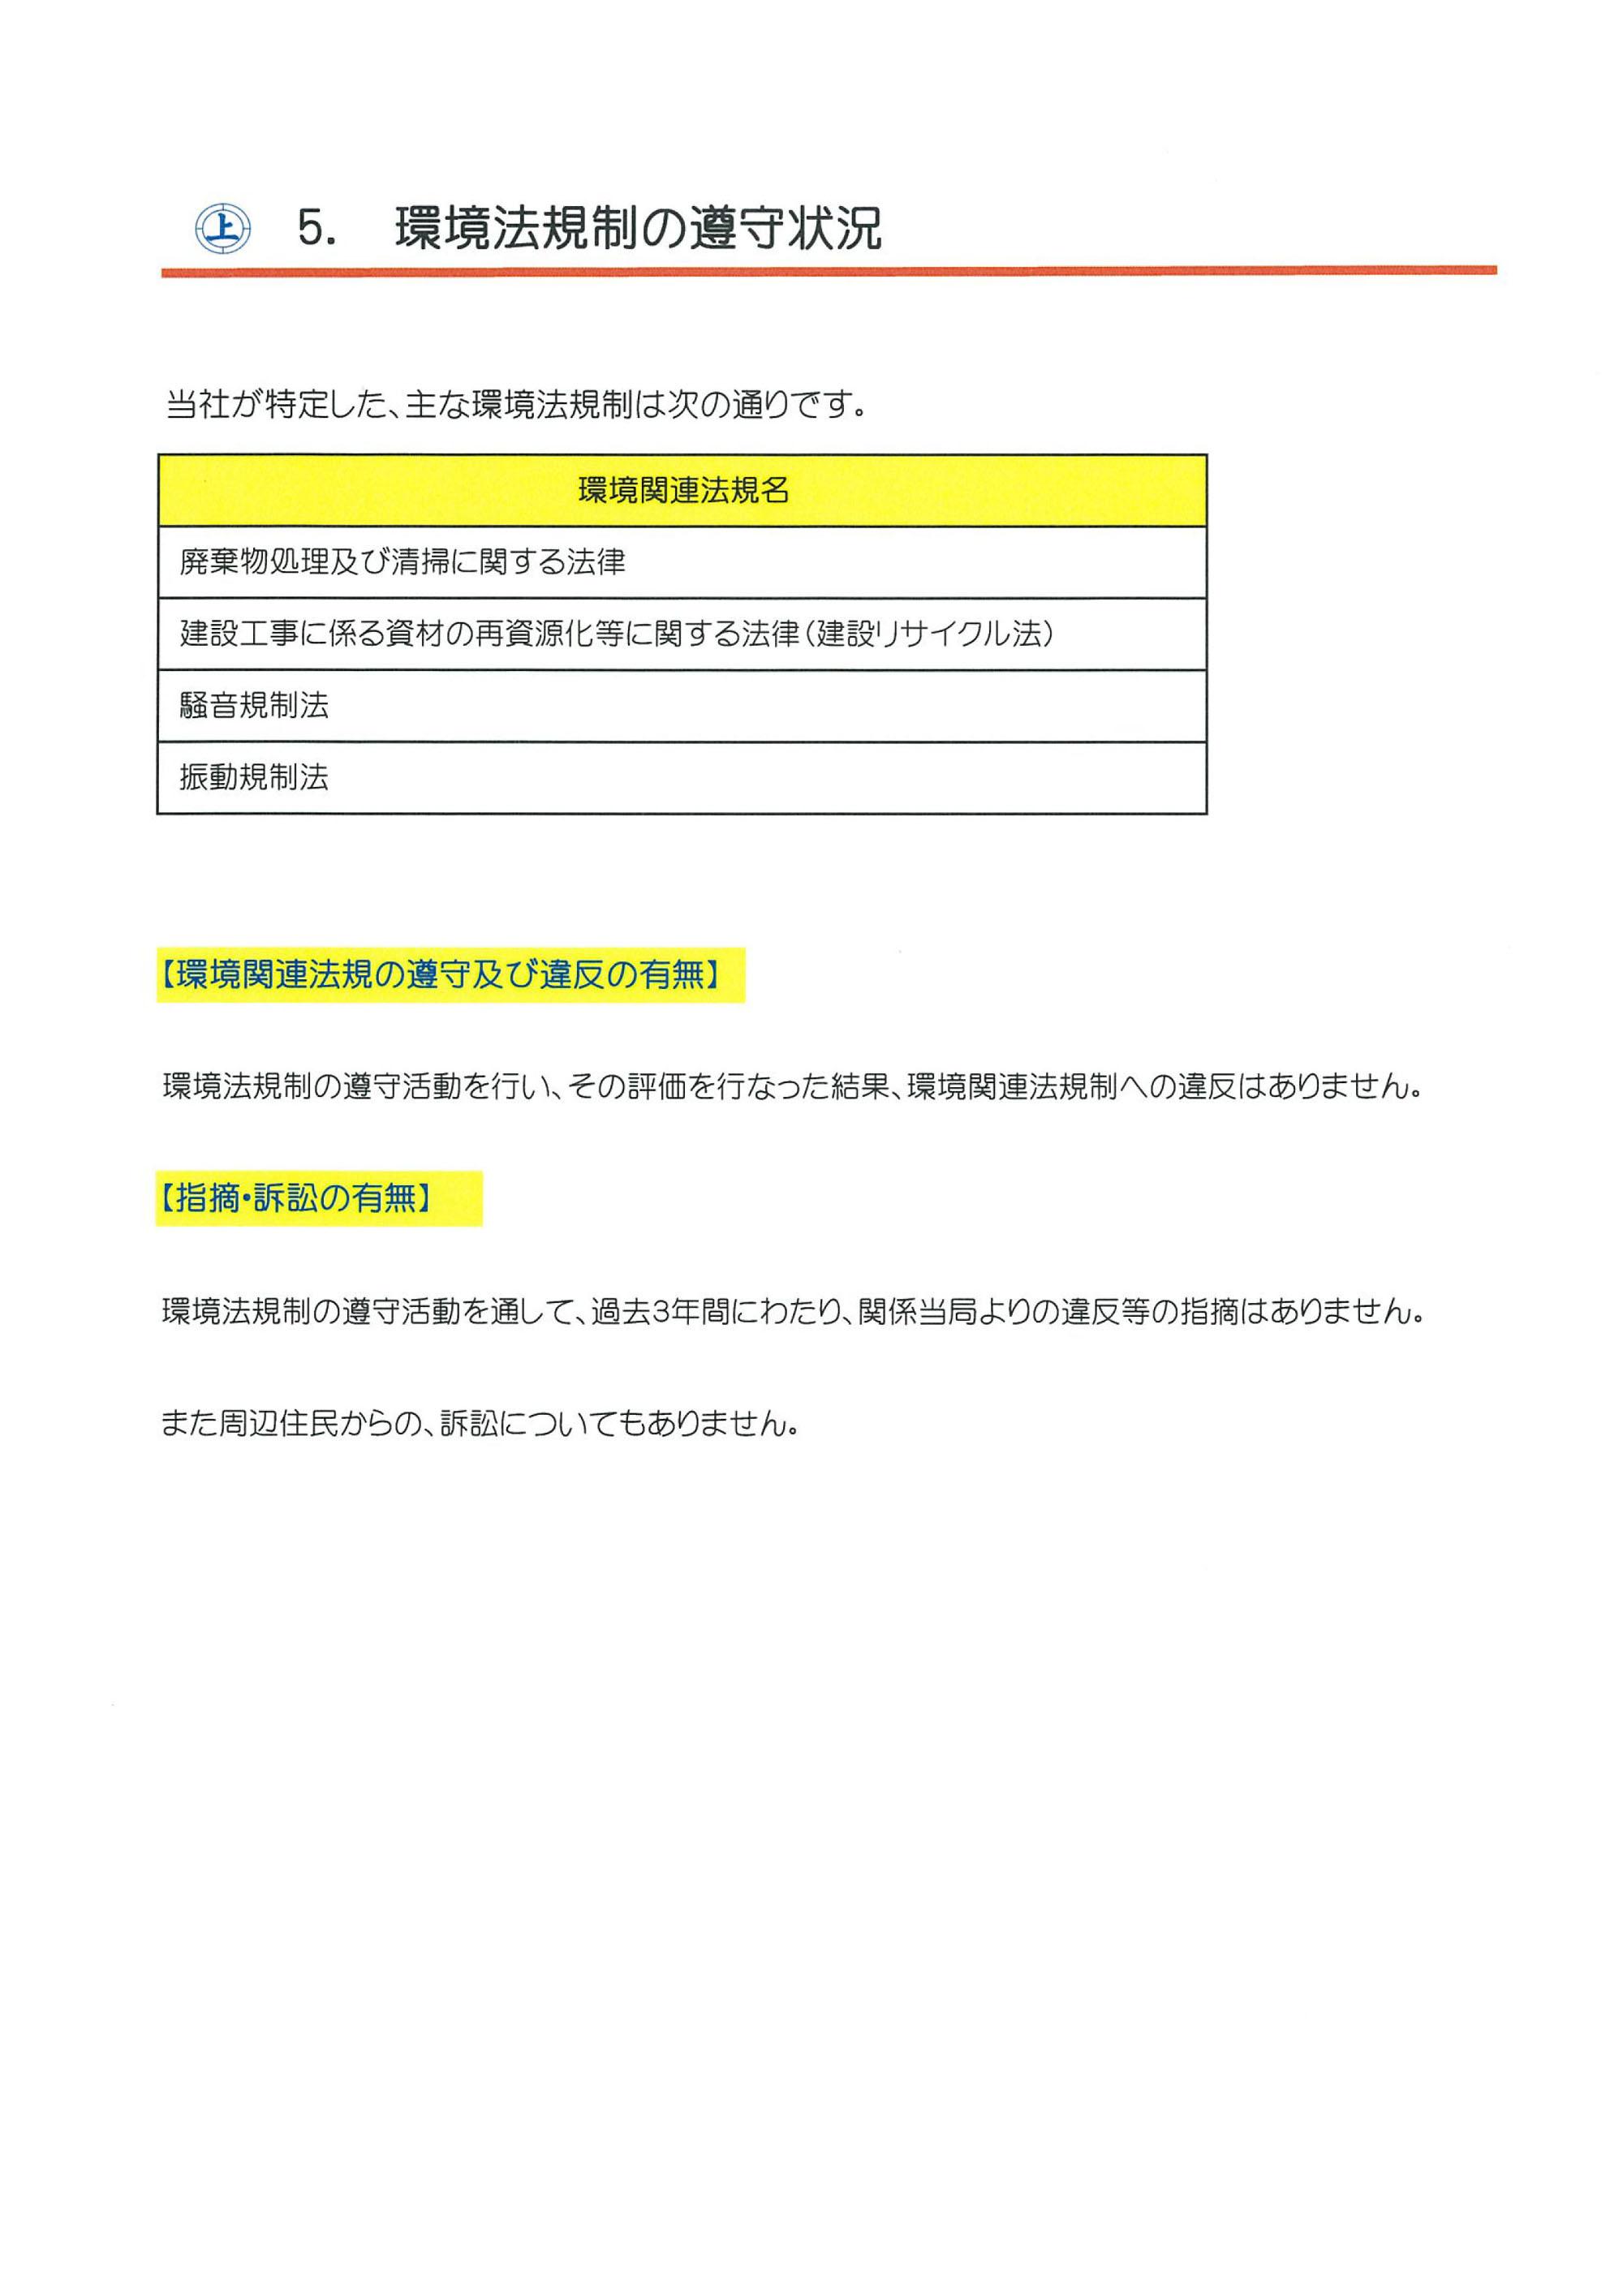 5.環境法規制の遵守状況 : 上田...